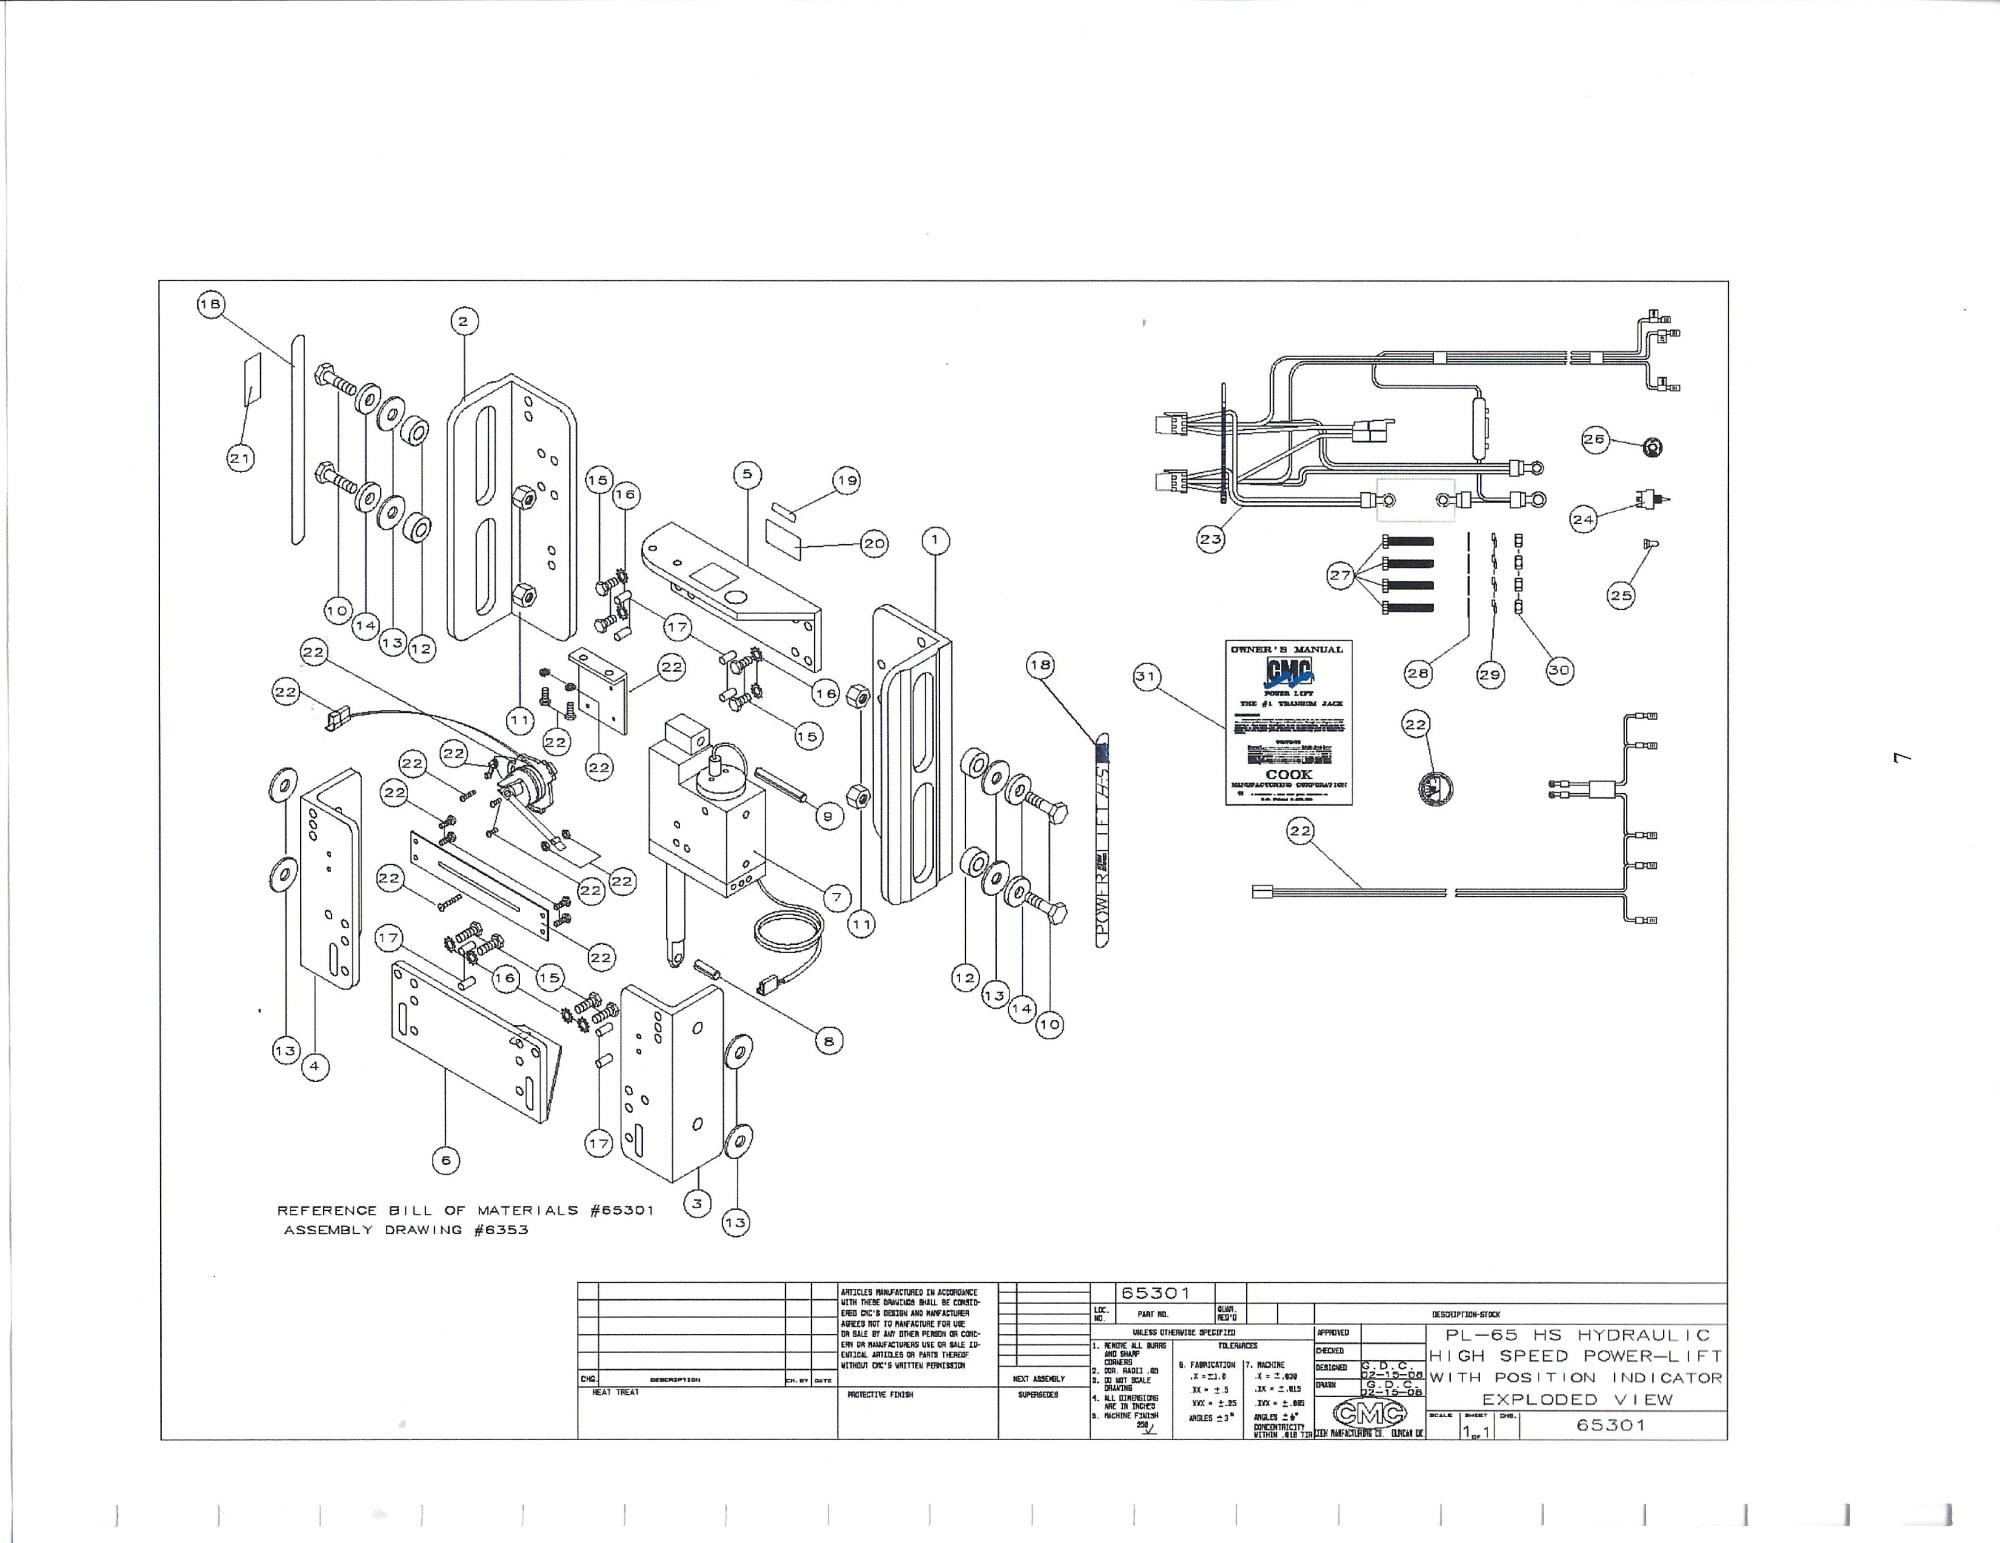 hight resolution of power lift jack plate wiring diagram diagram data schema bob s jack plate wiring diagram cmc pl